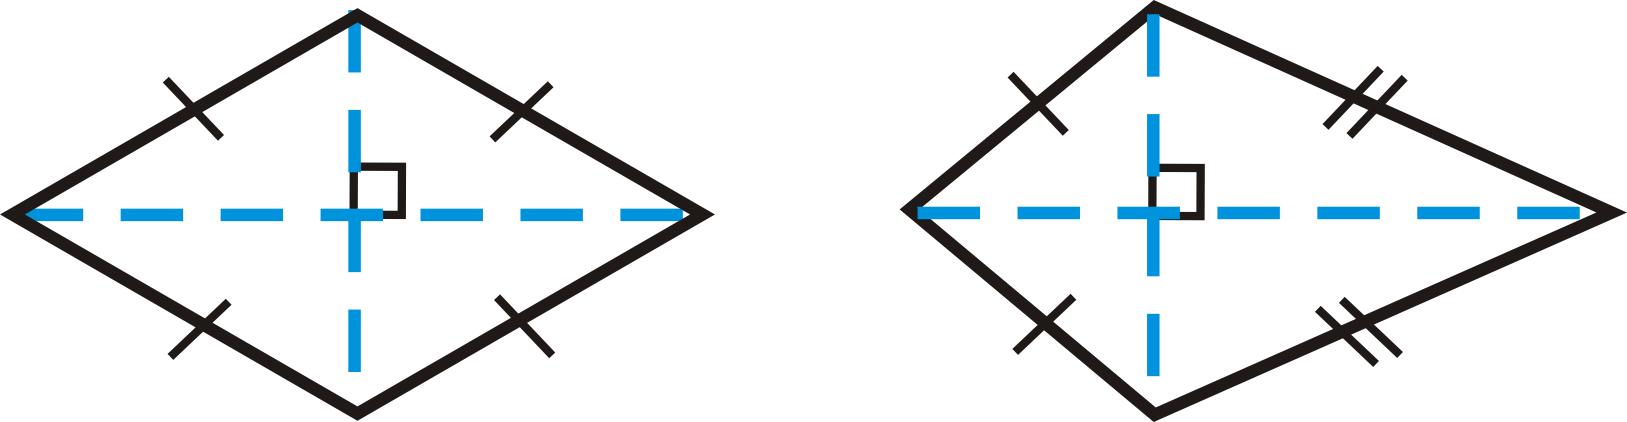 Trapezoids, Rhombi, and Kites | CK-12 Foundation